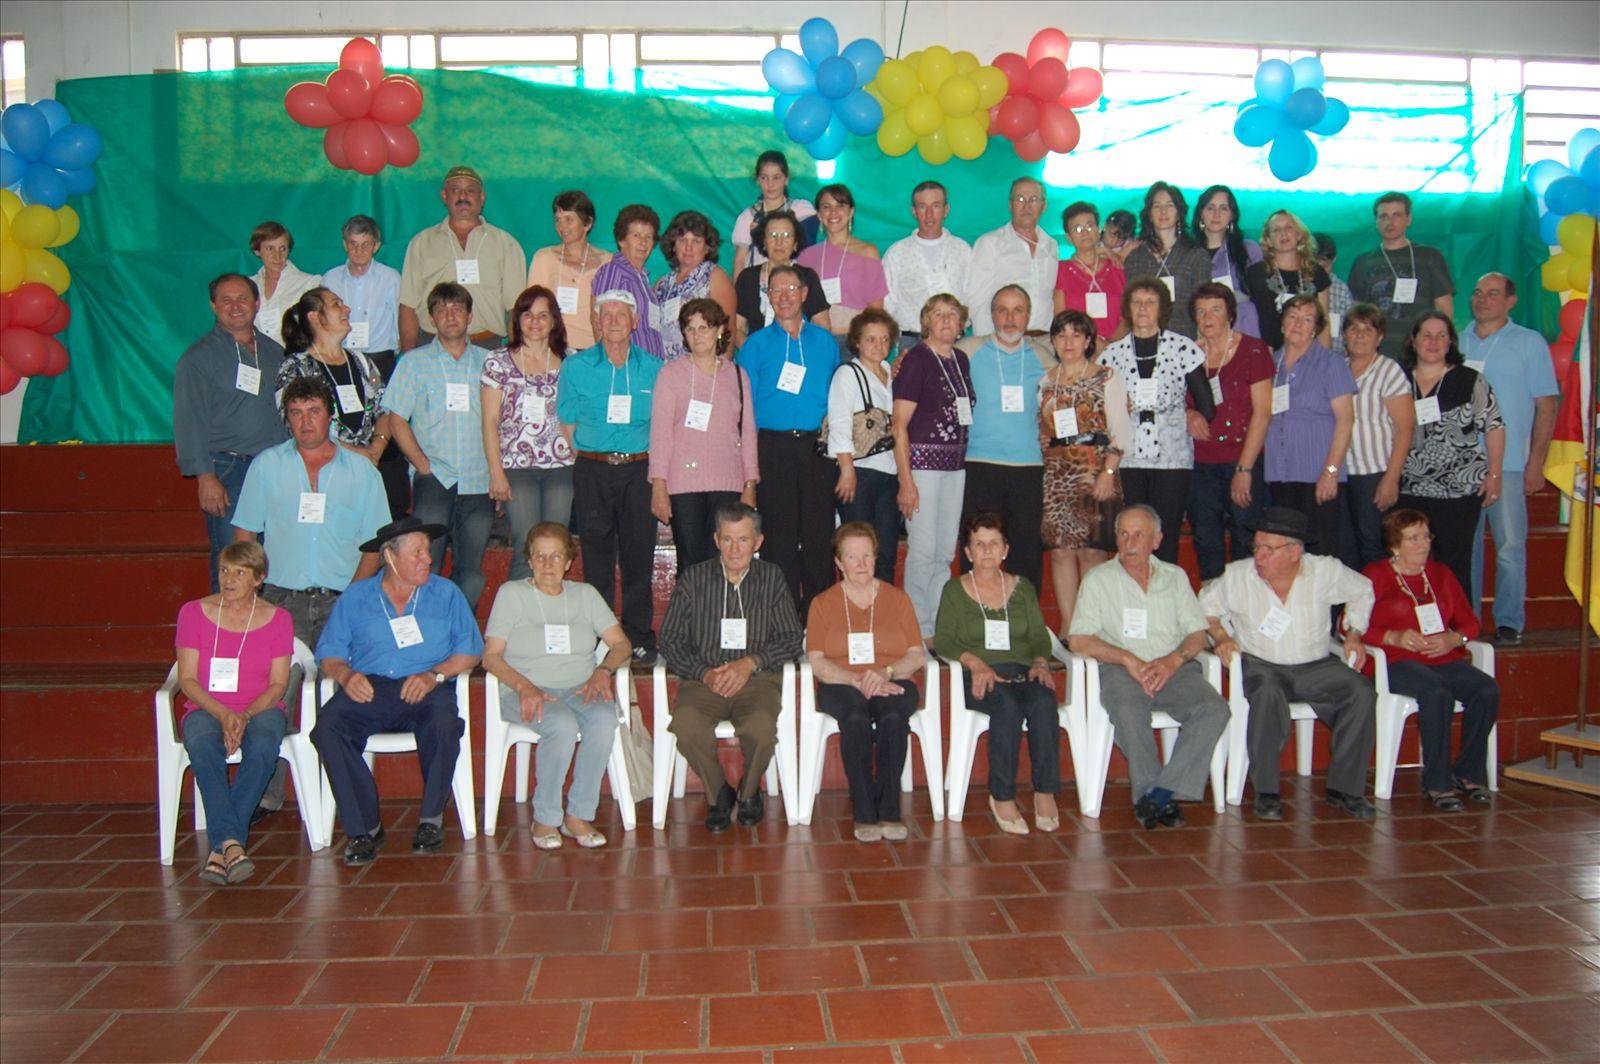 2º Encontro Família Cornelli - 11.10.2009 (184)_0